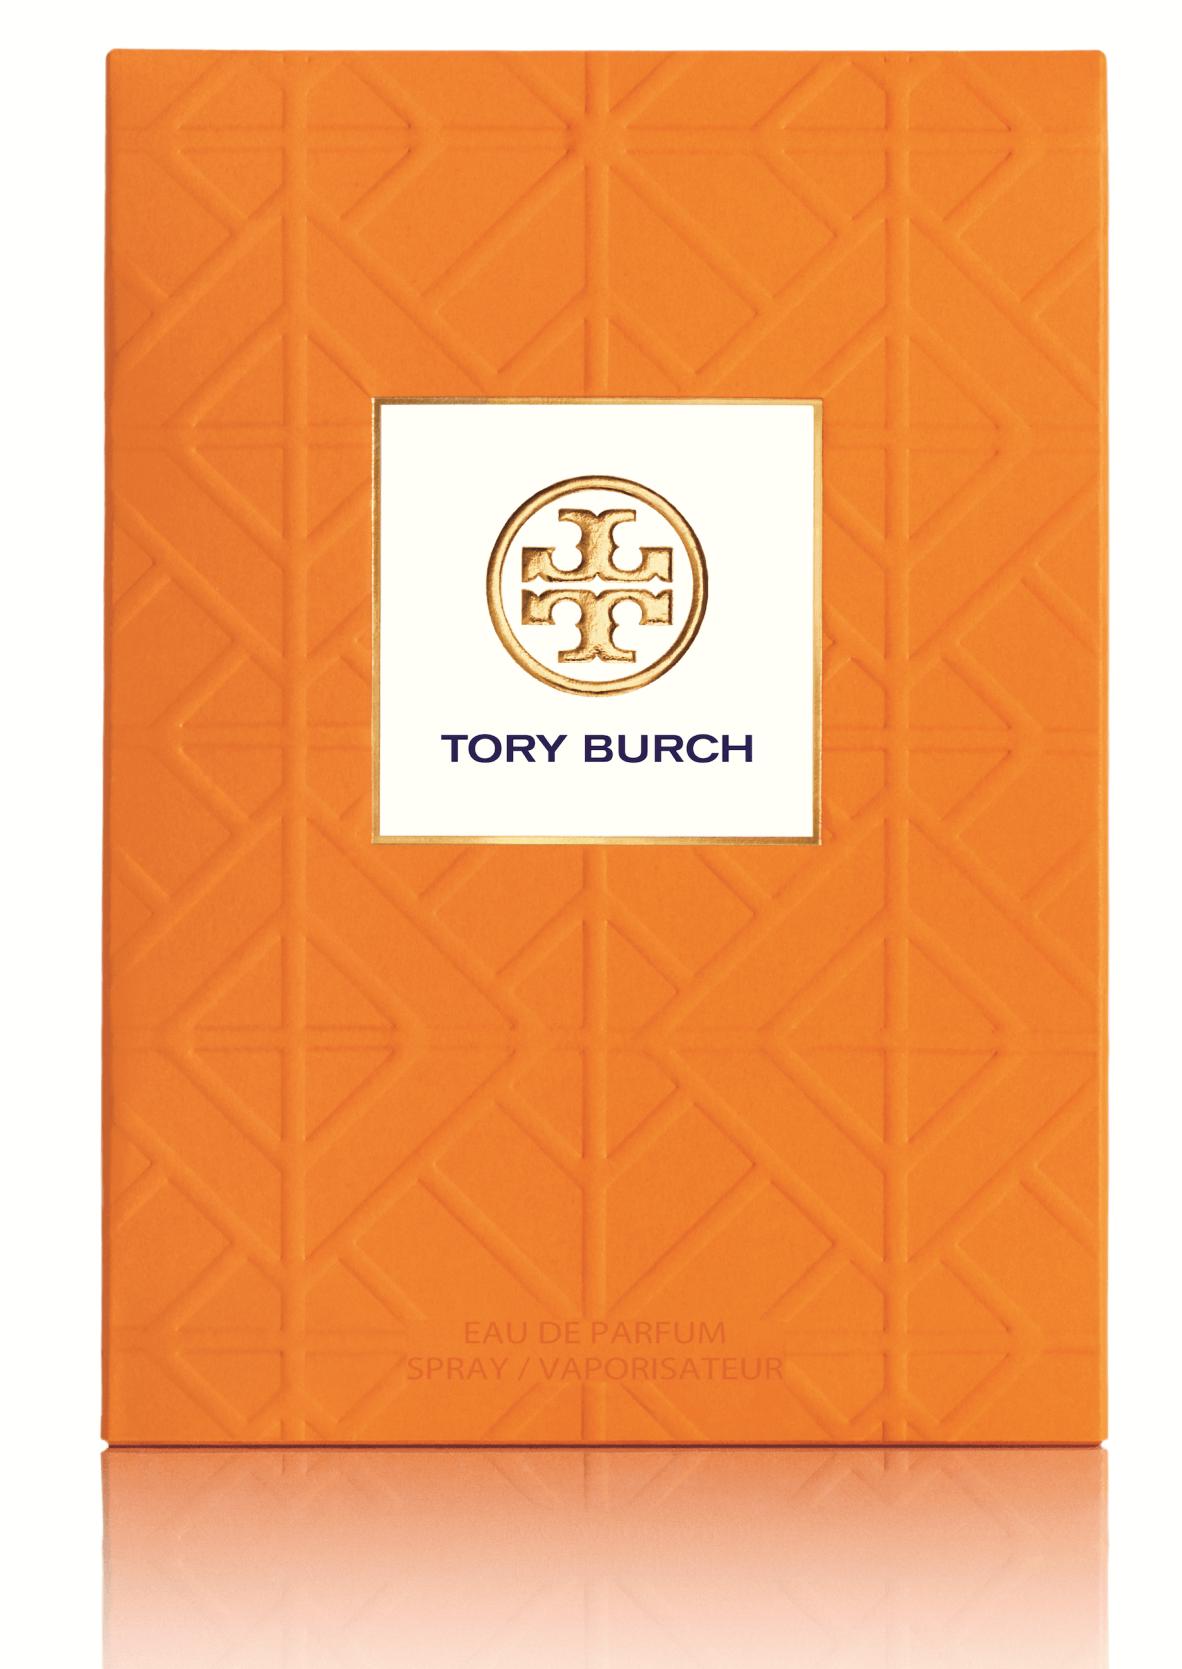 Tory Burch Perfume Box